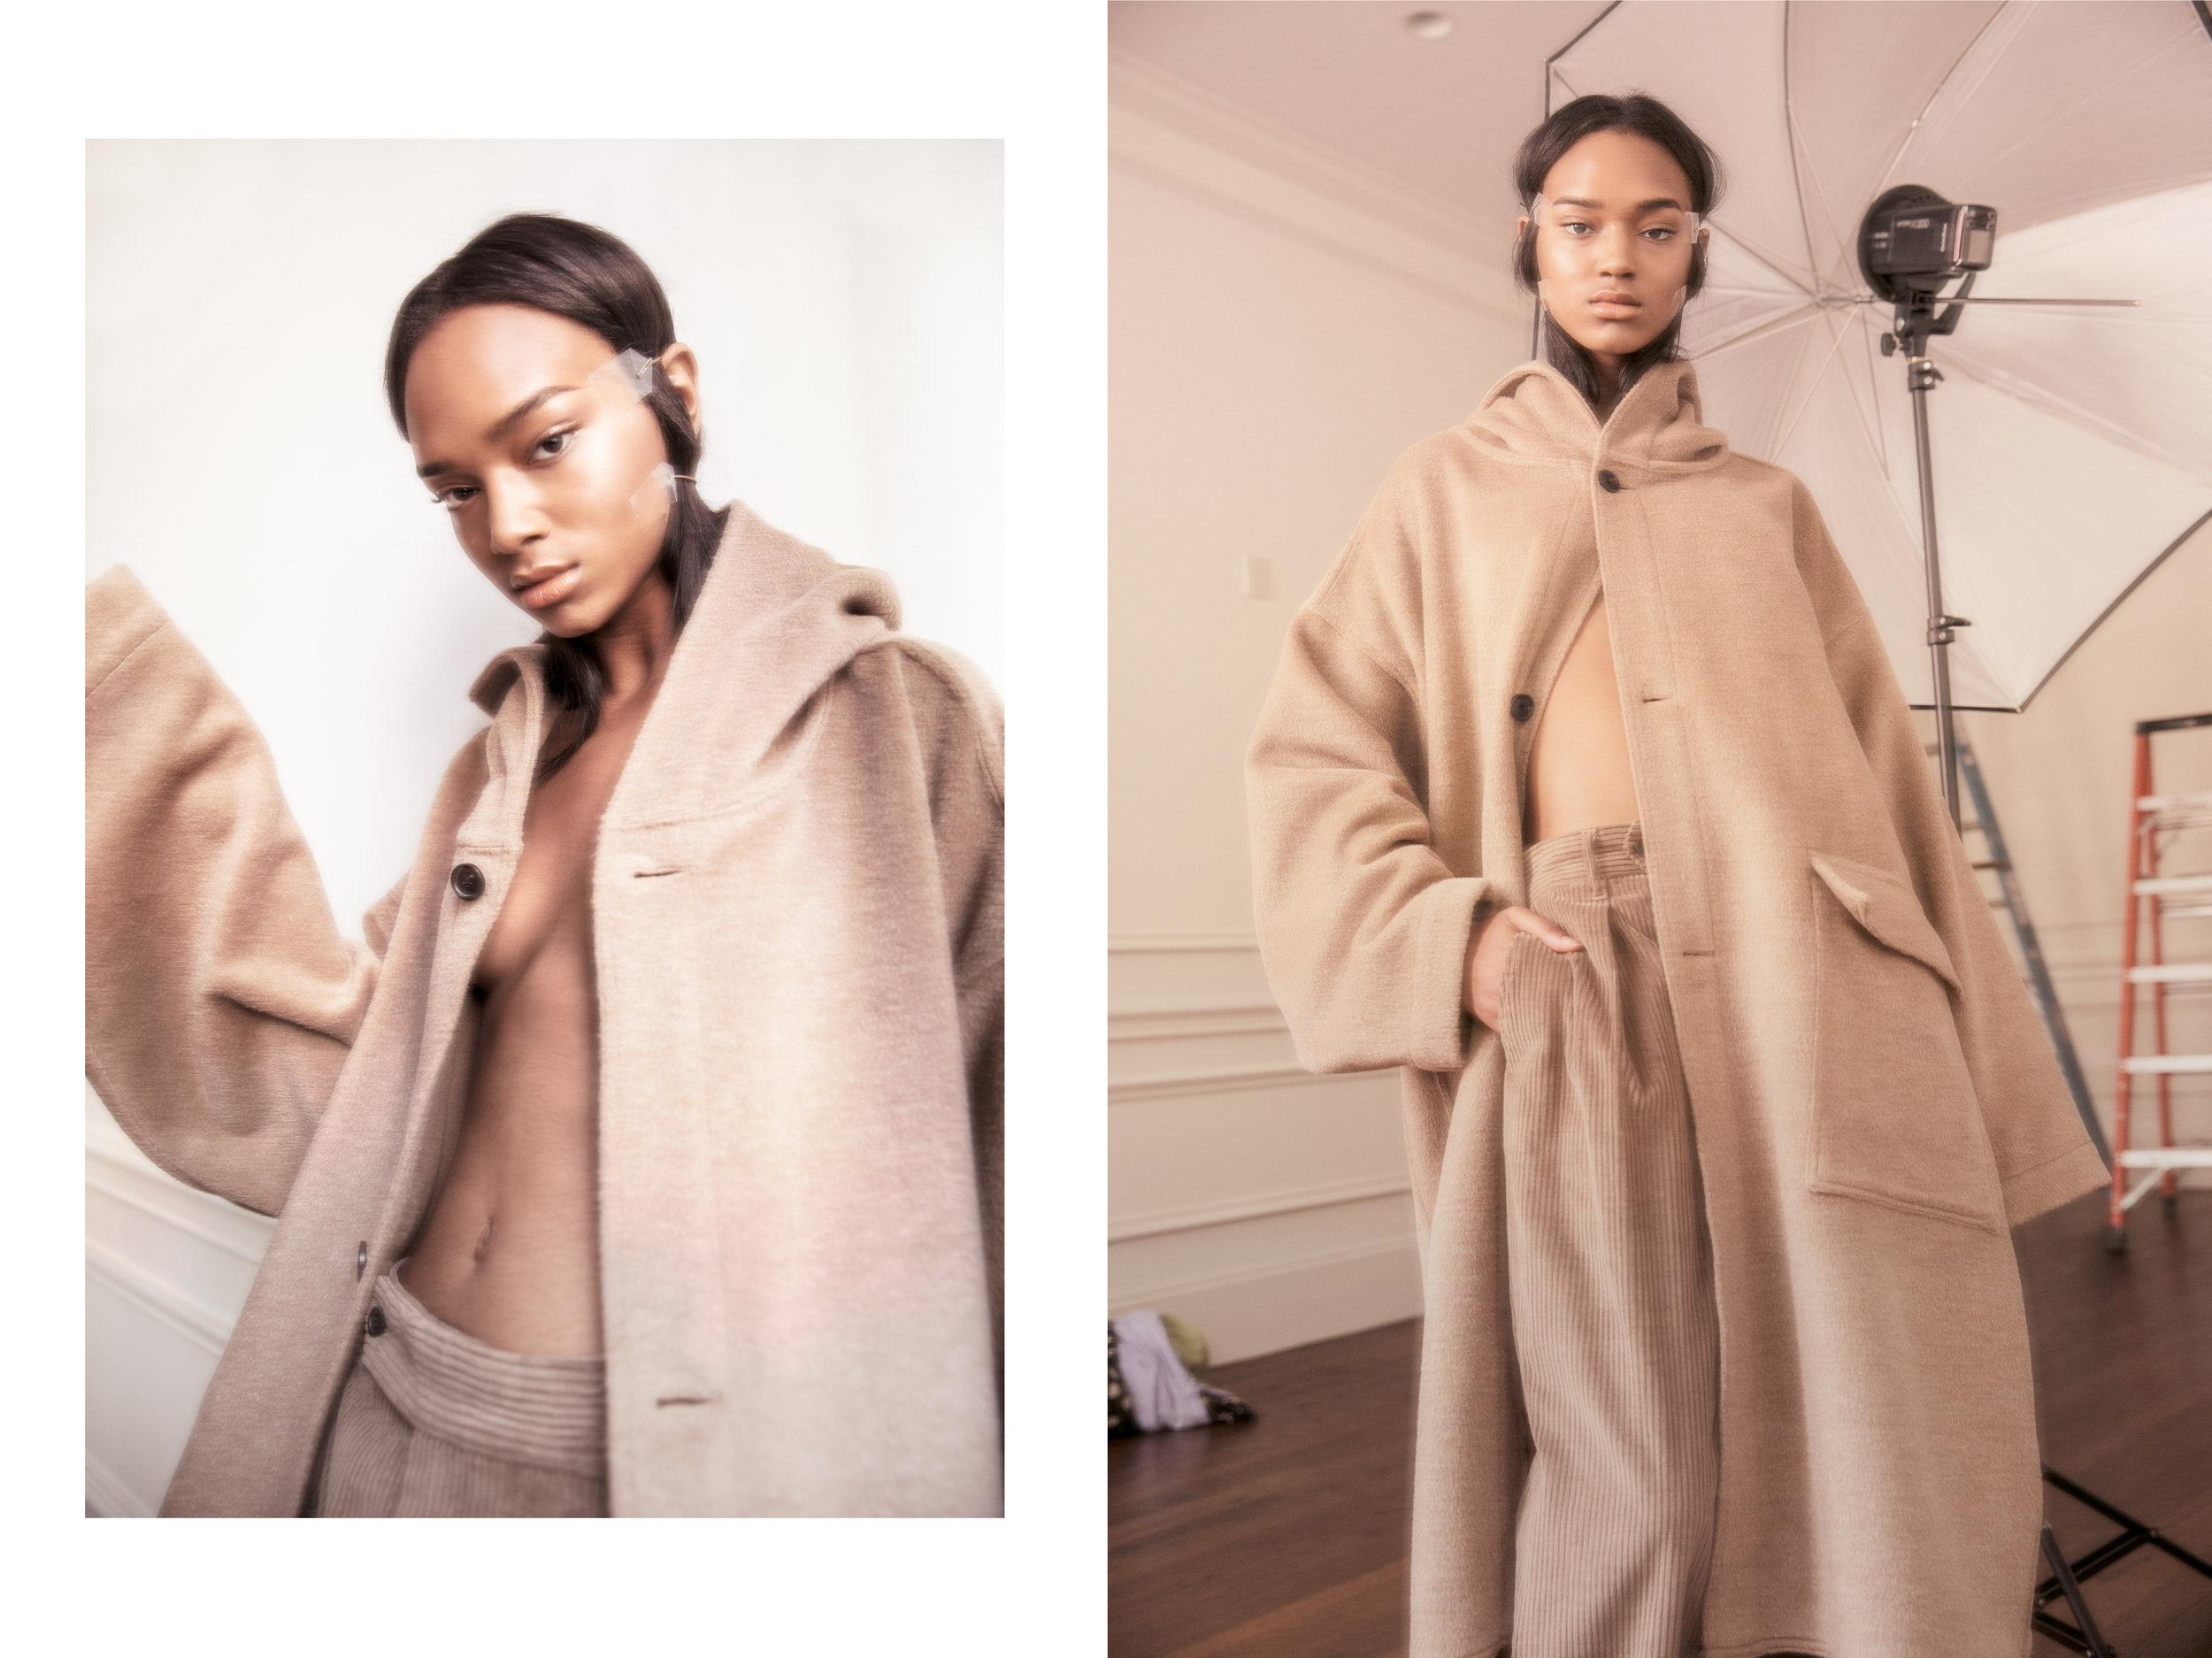 2-Julia NY Models.jpg